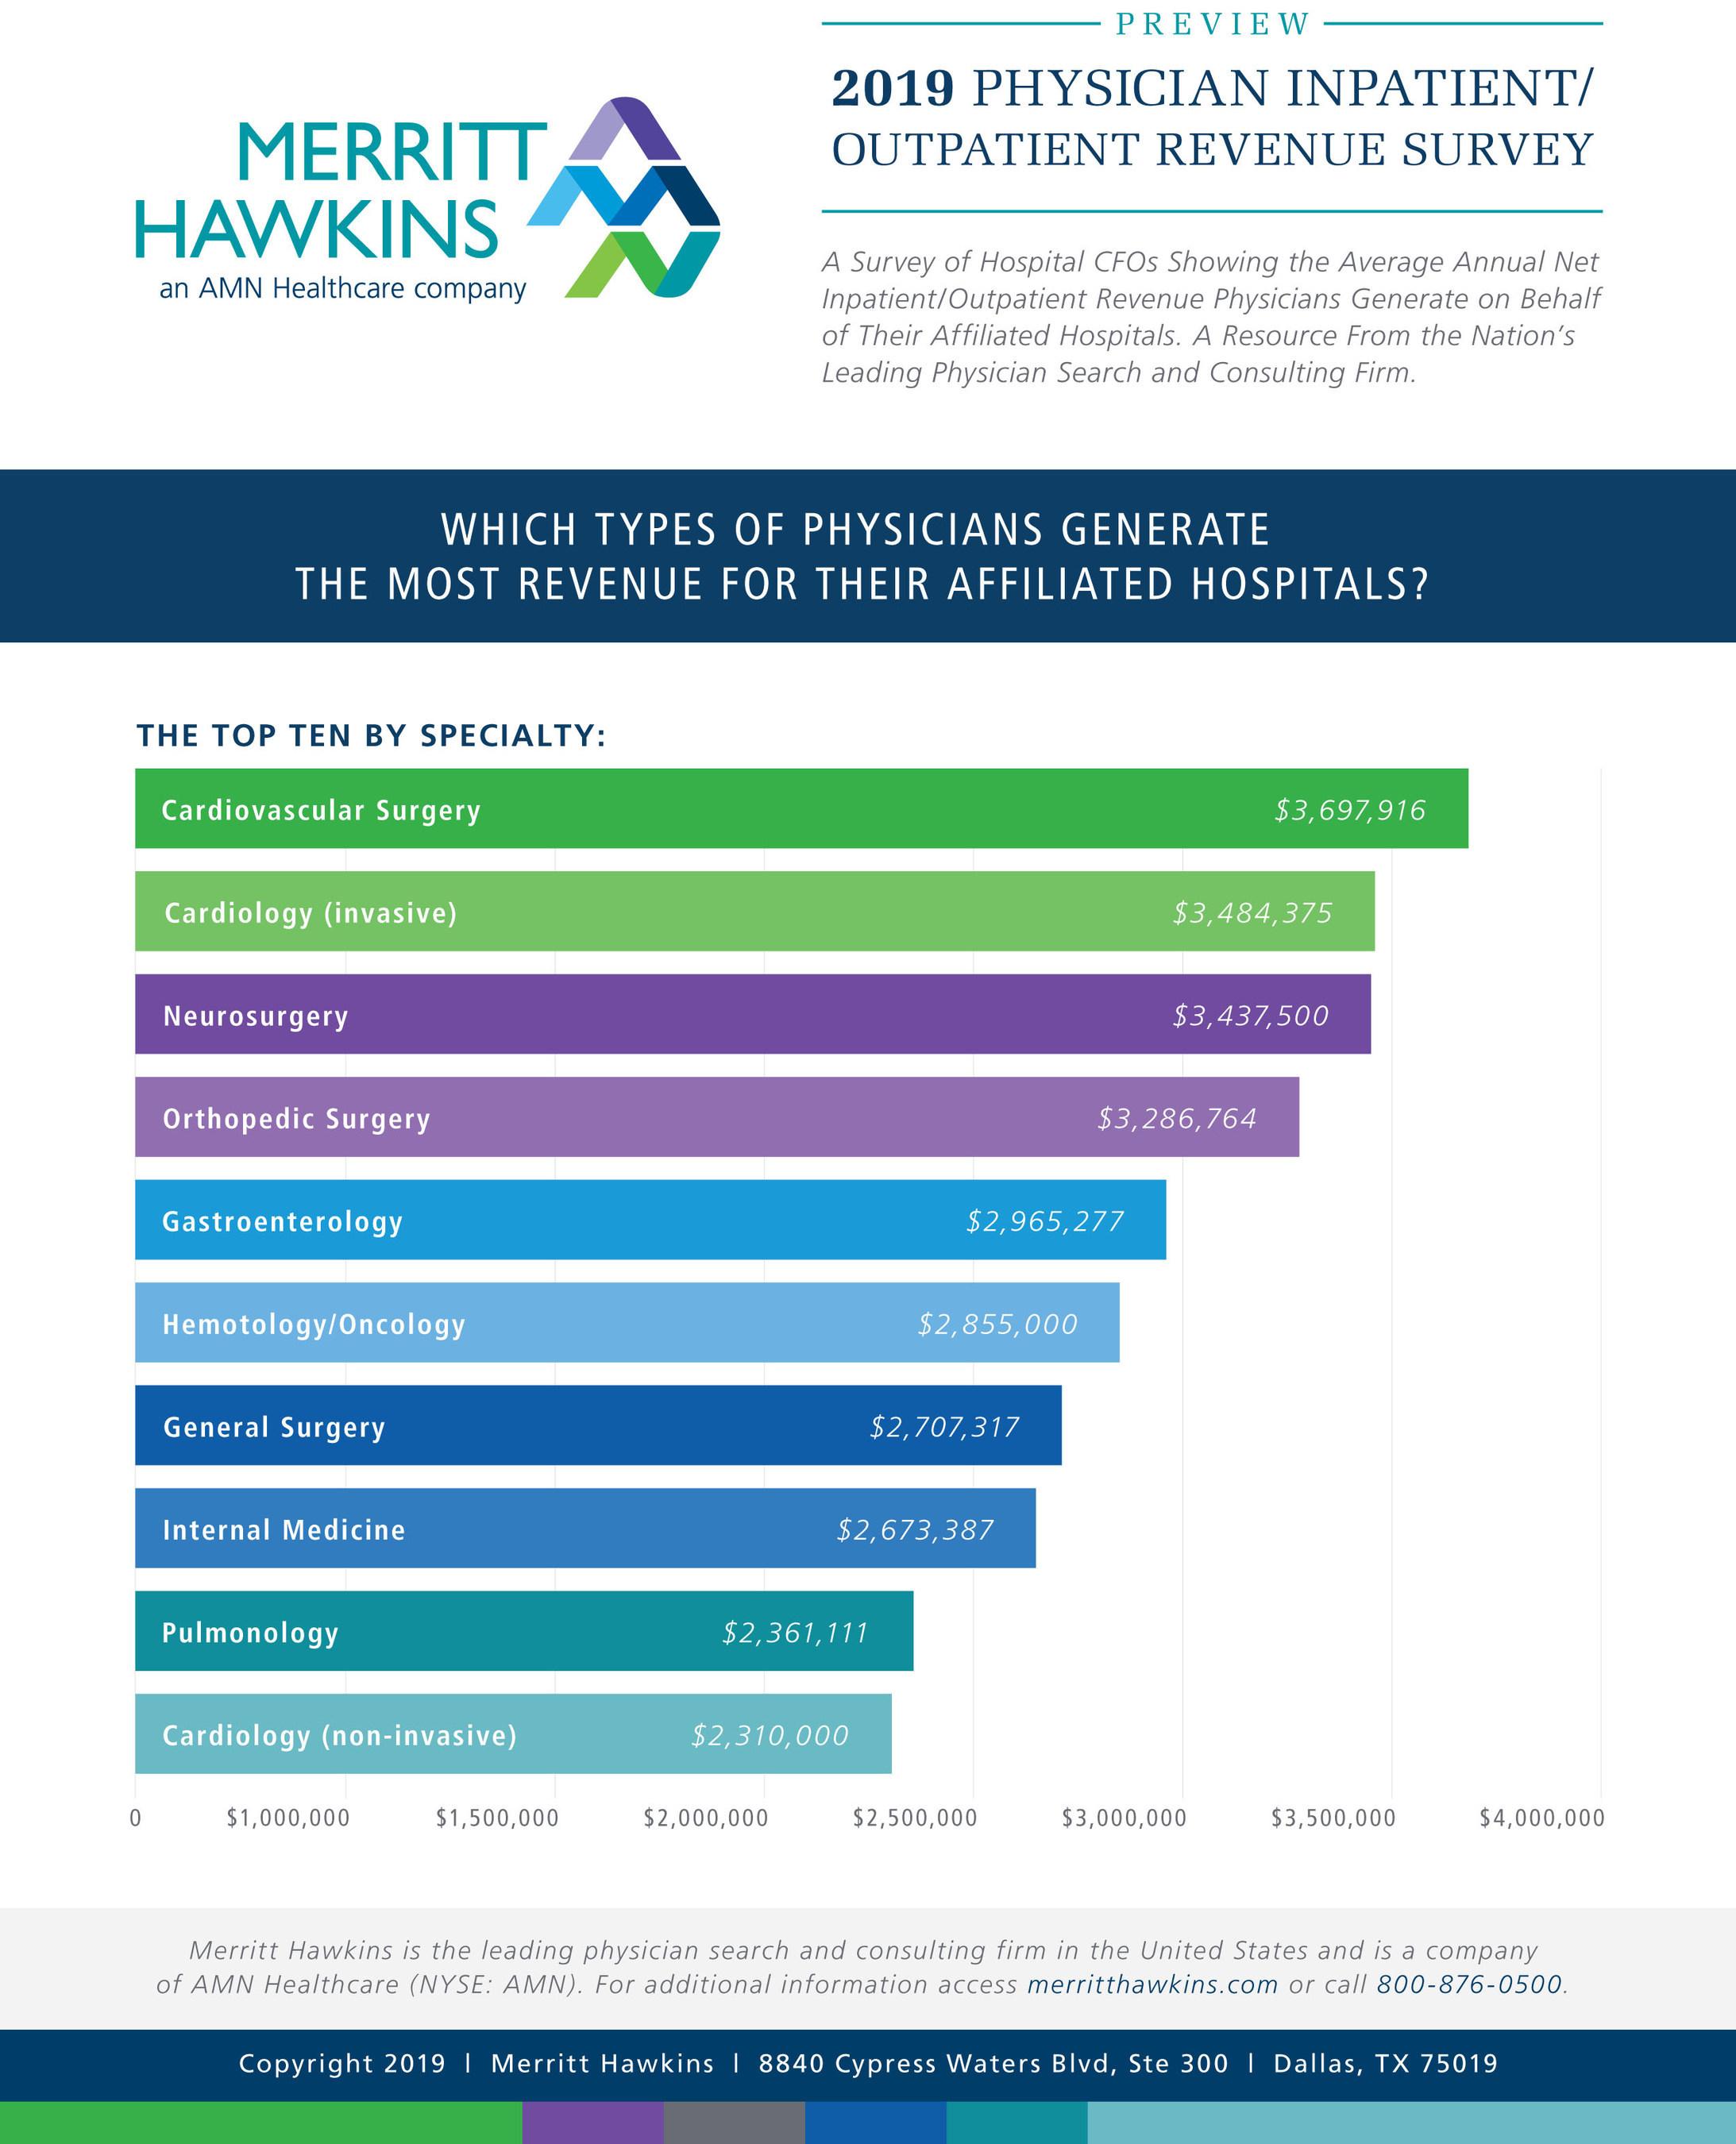 2019-Physician-Revenue-Survey-infographic-ID-8f905b7b75c8 Infographic